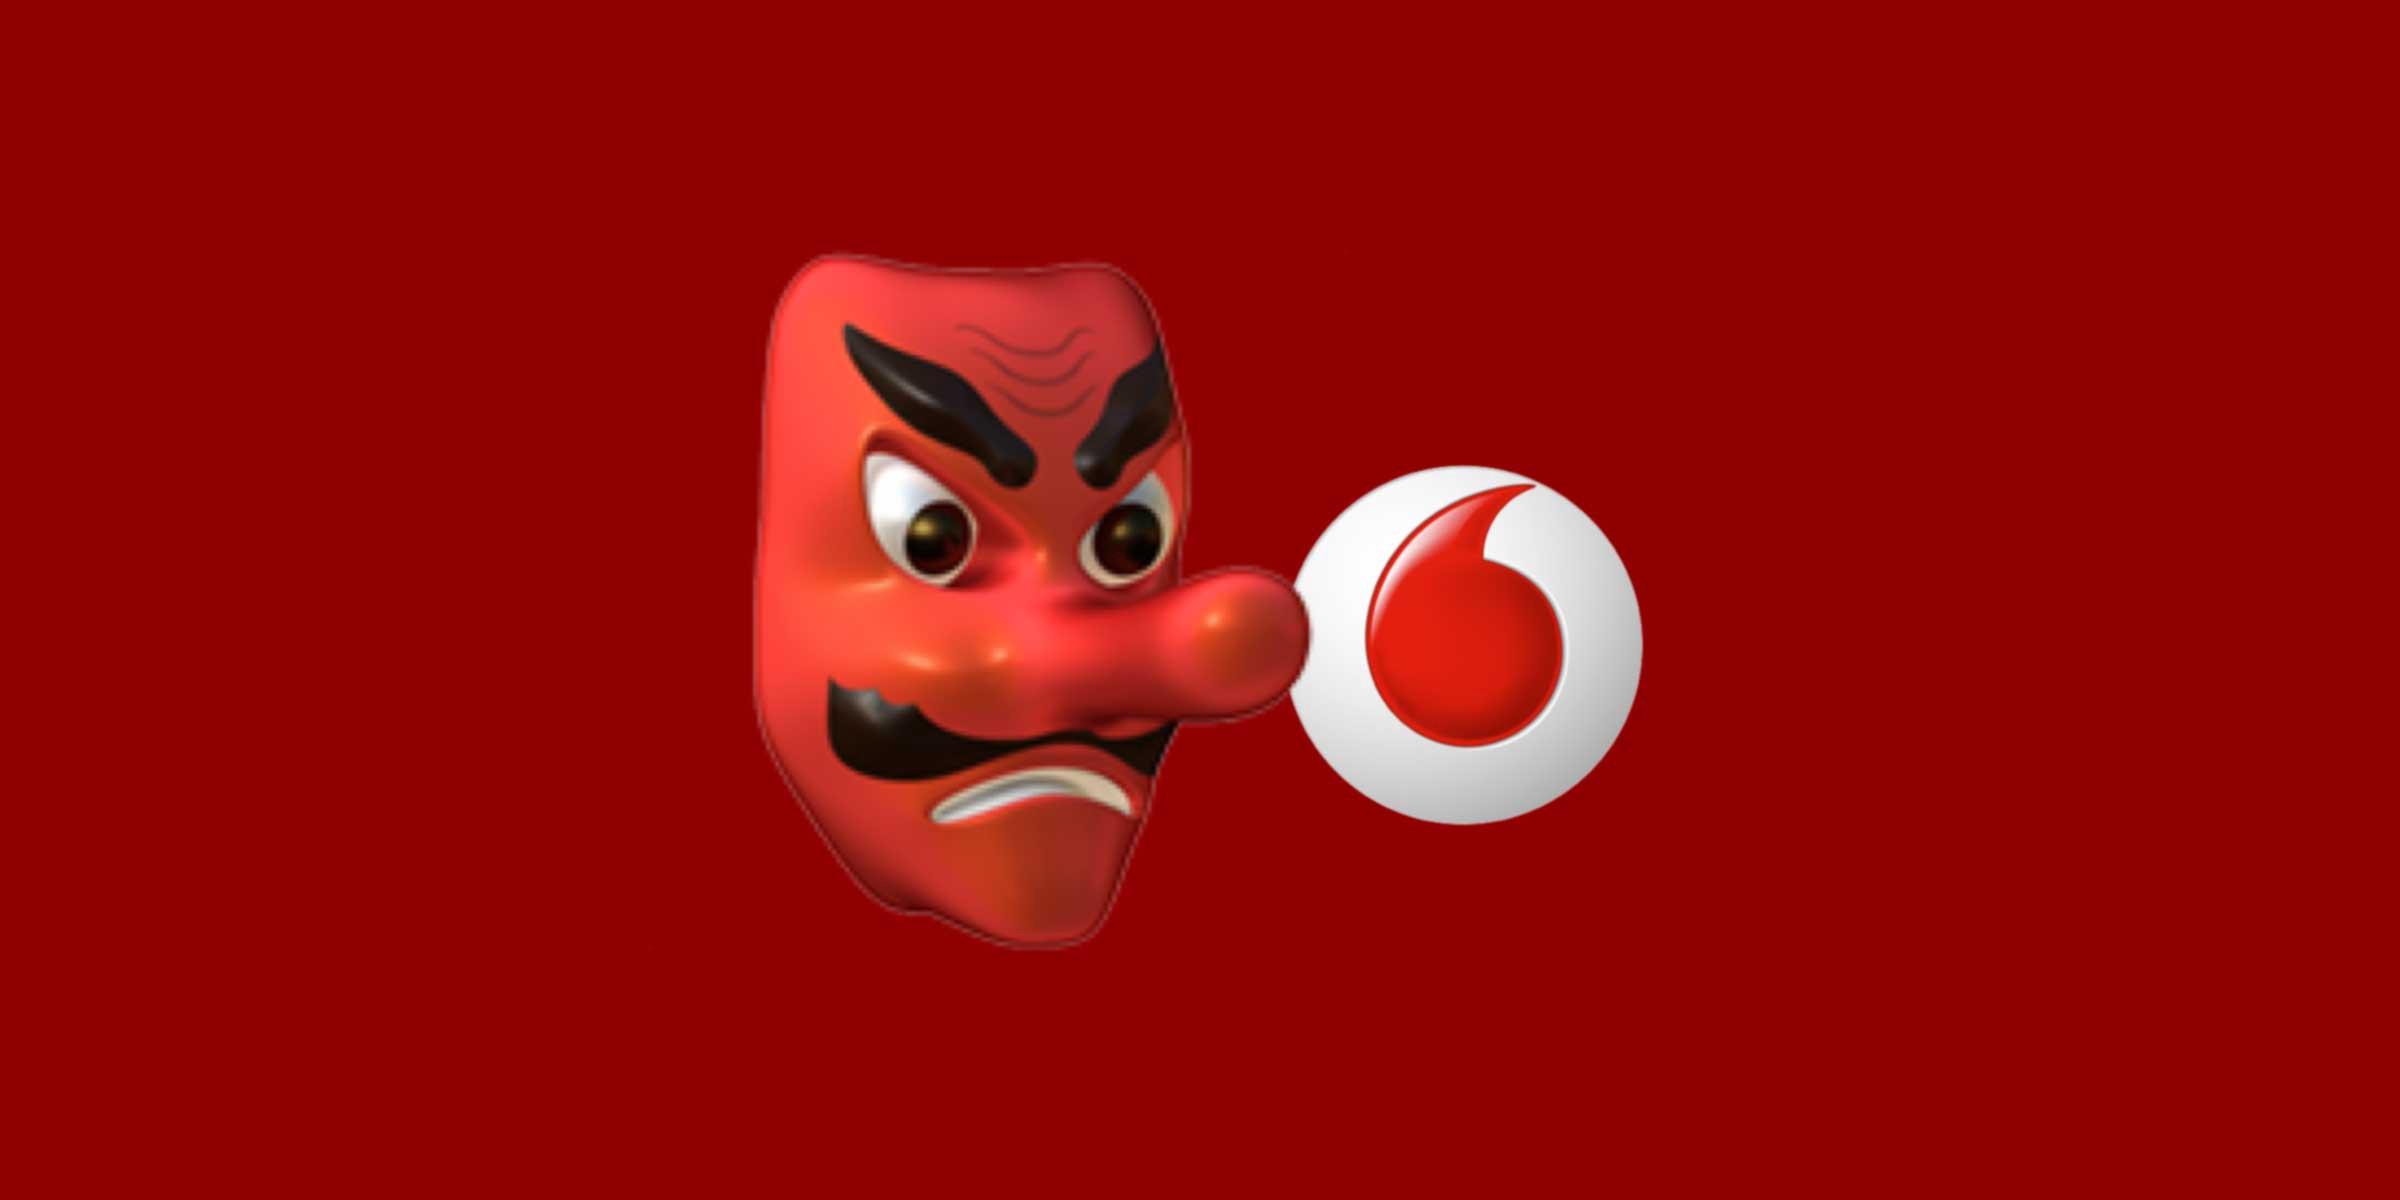 /dear-vodafone-please-respect-my-privacy-c4a70283760 feature image